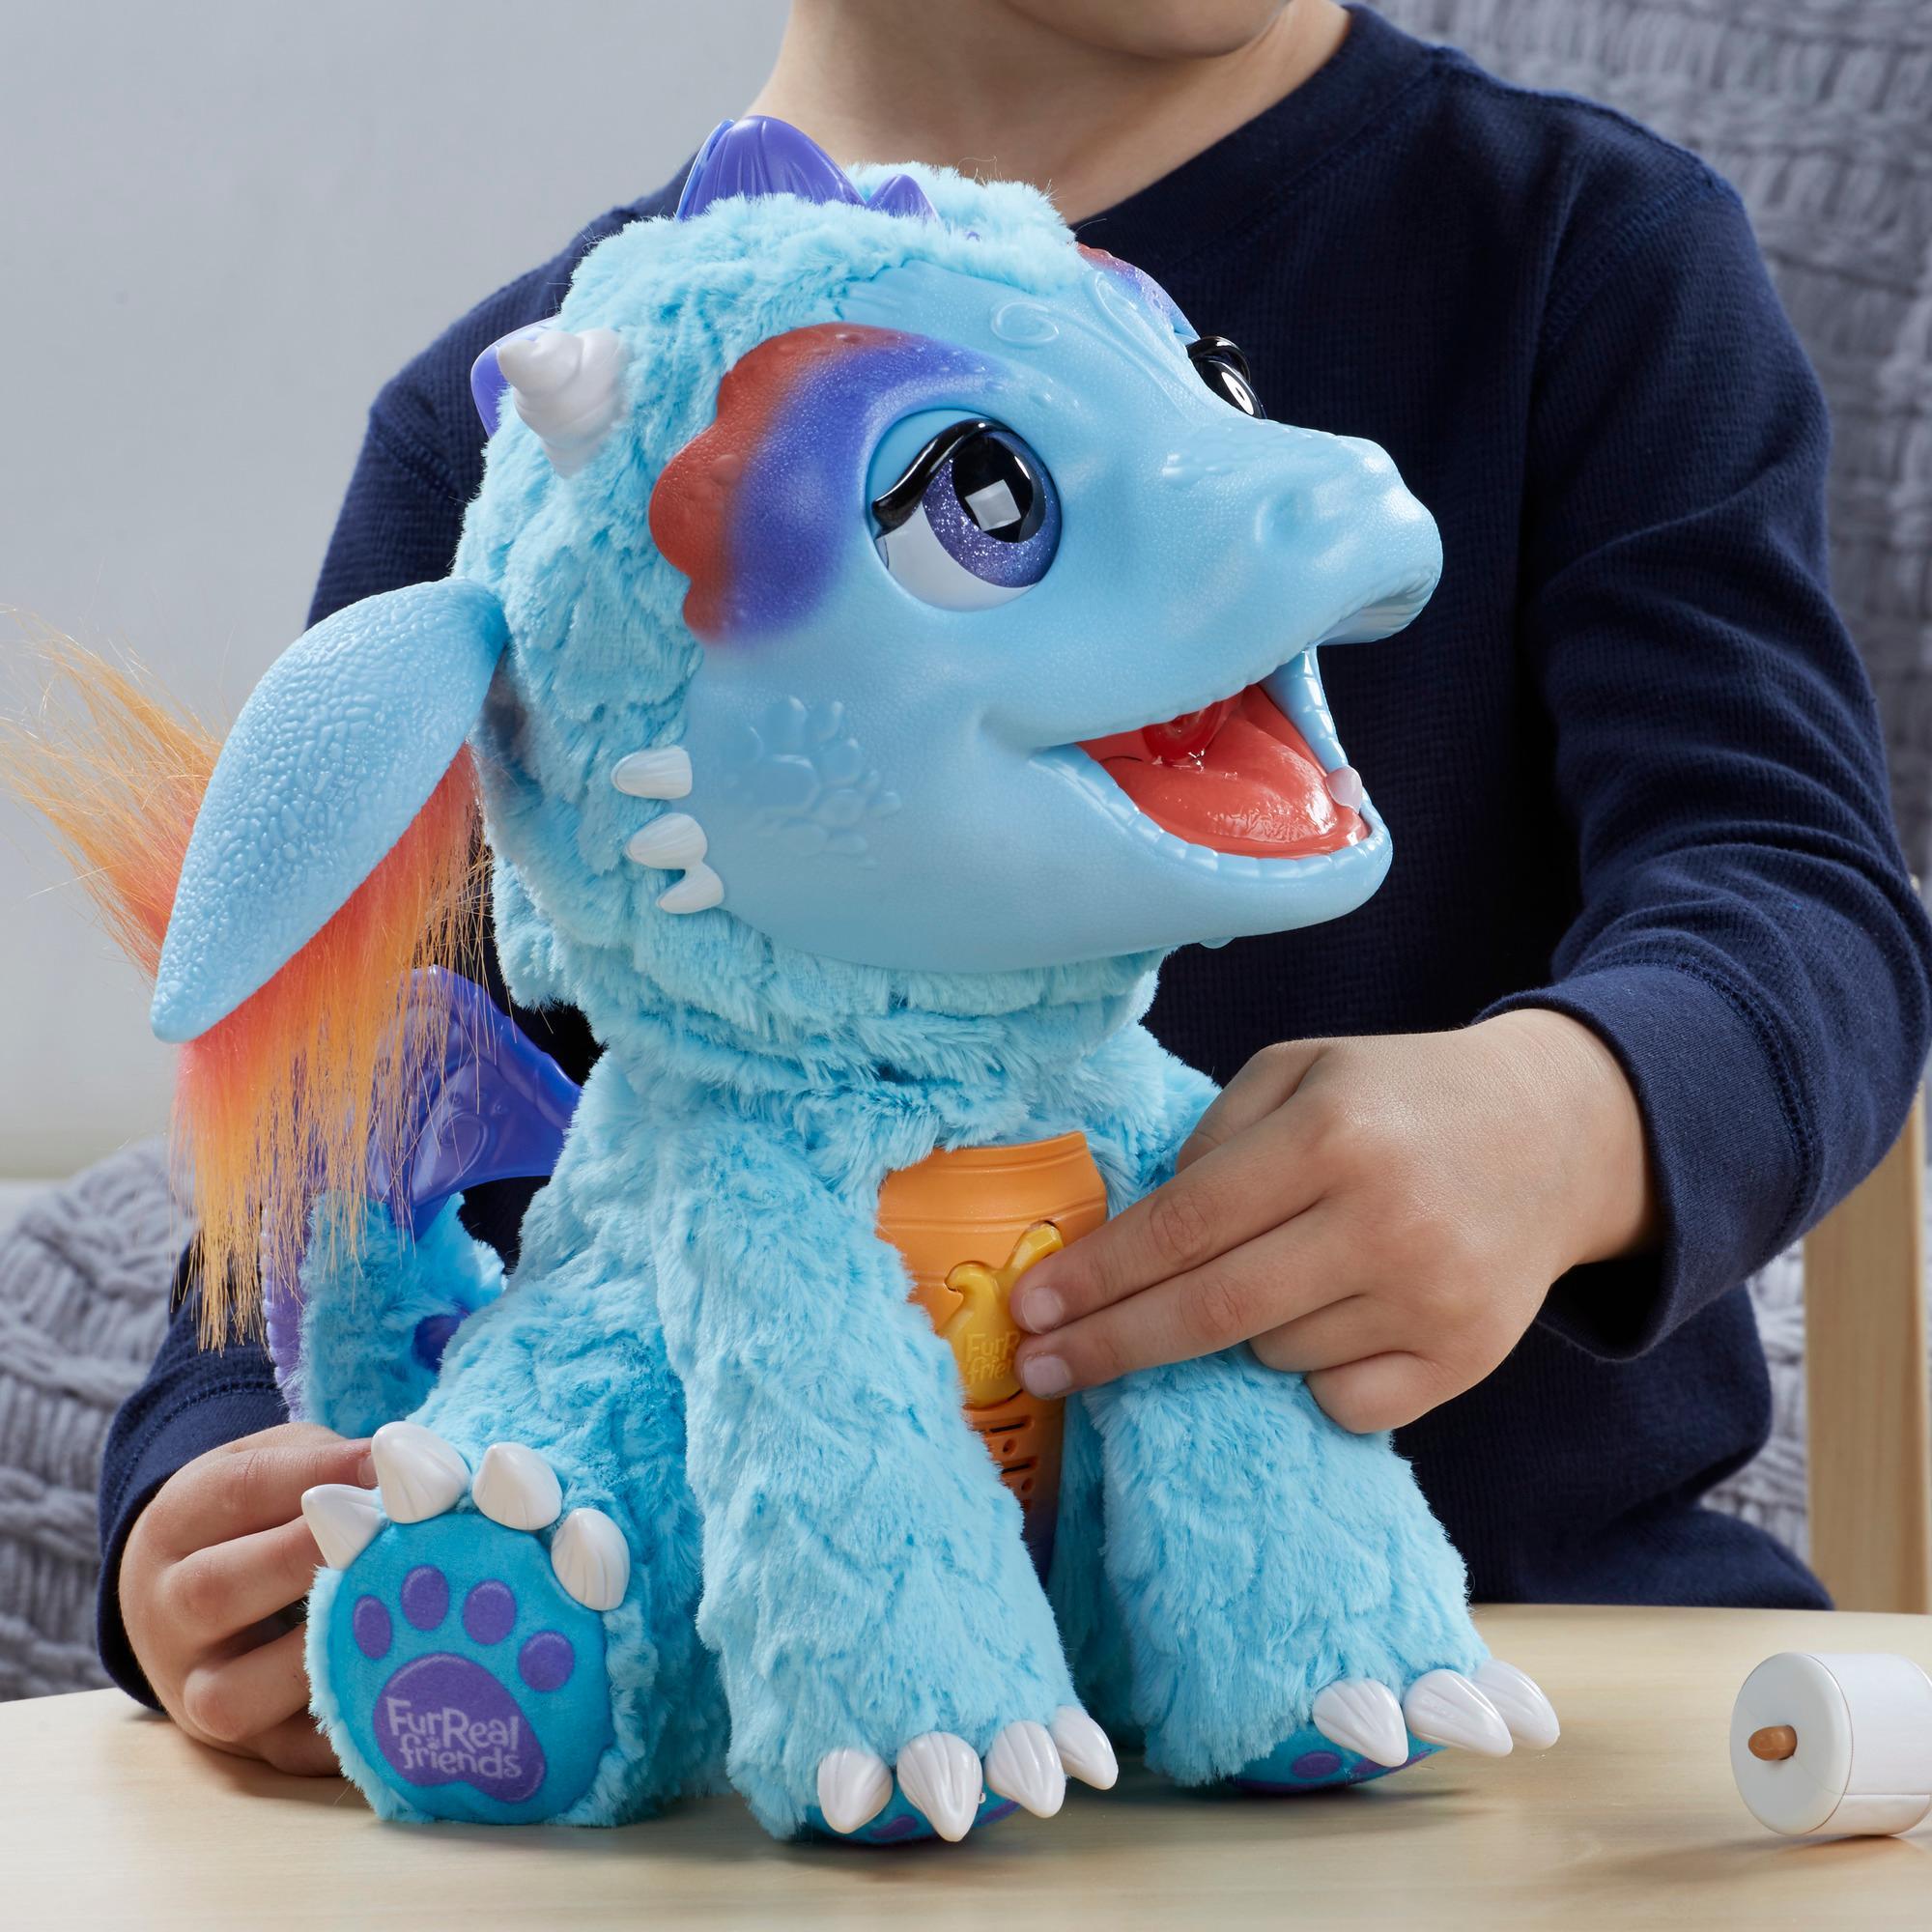 Amazon.com: FurReal Friends Torch, My Blazin' Dragon: Toys & Games